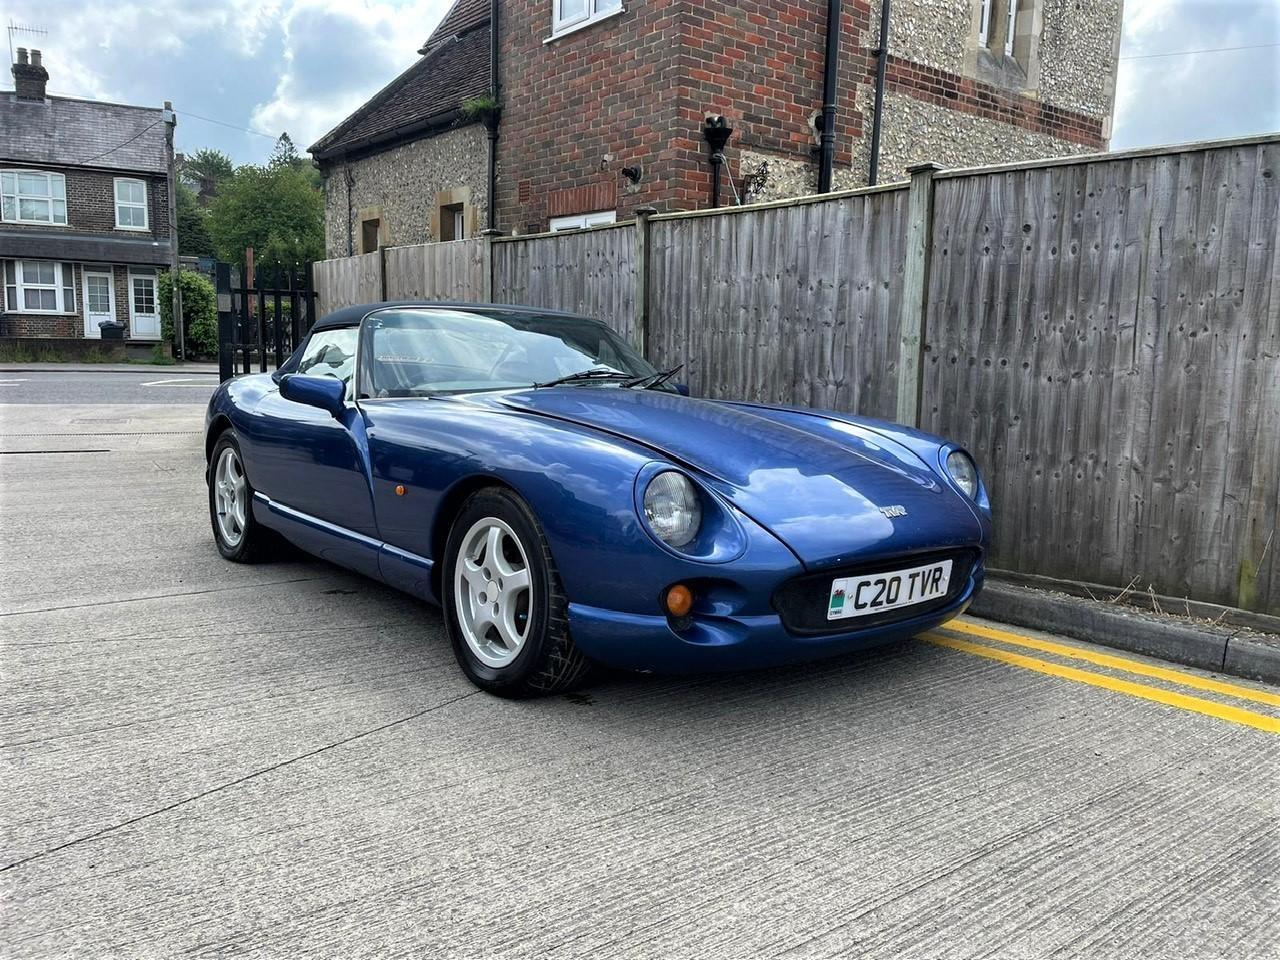 1993 (L) TVR Chimaera 4.0 2dr For Sale In Chesham, Buckinghamshire